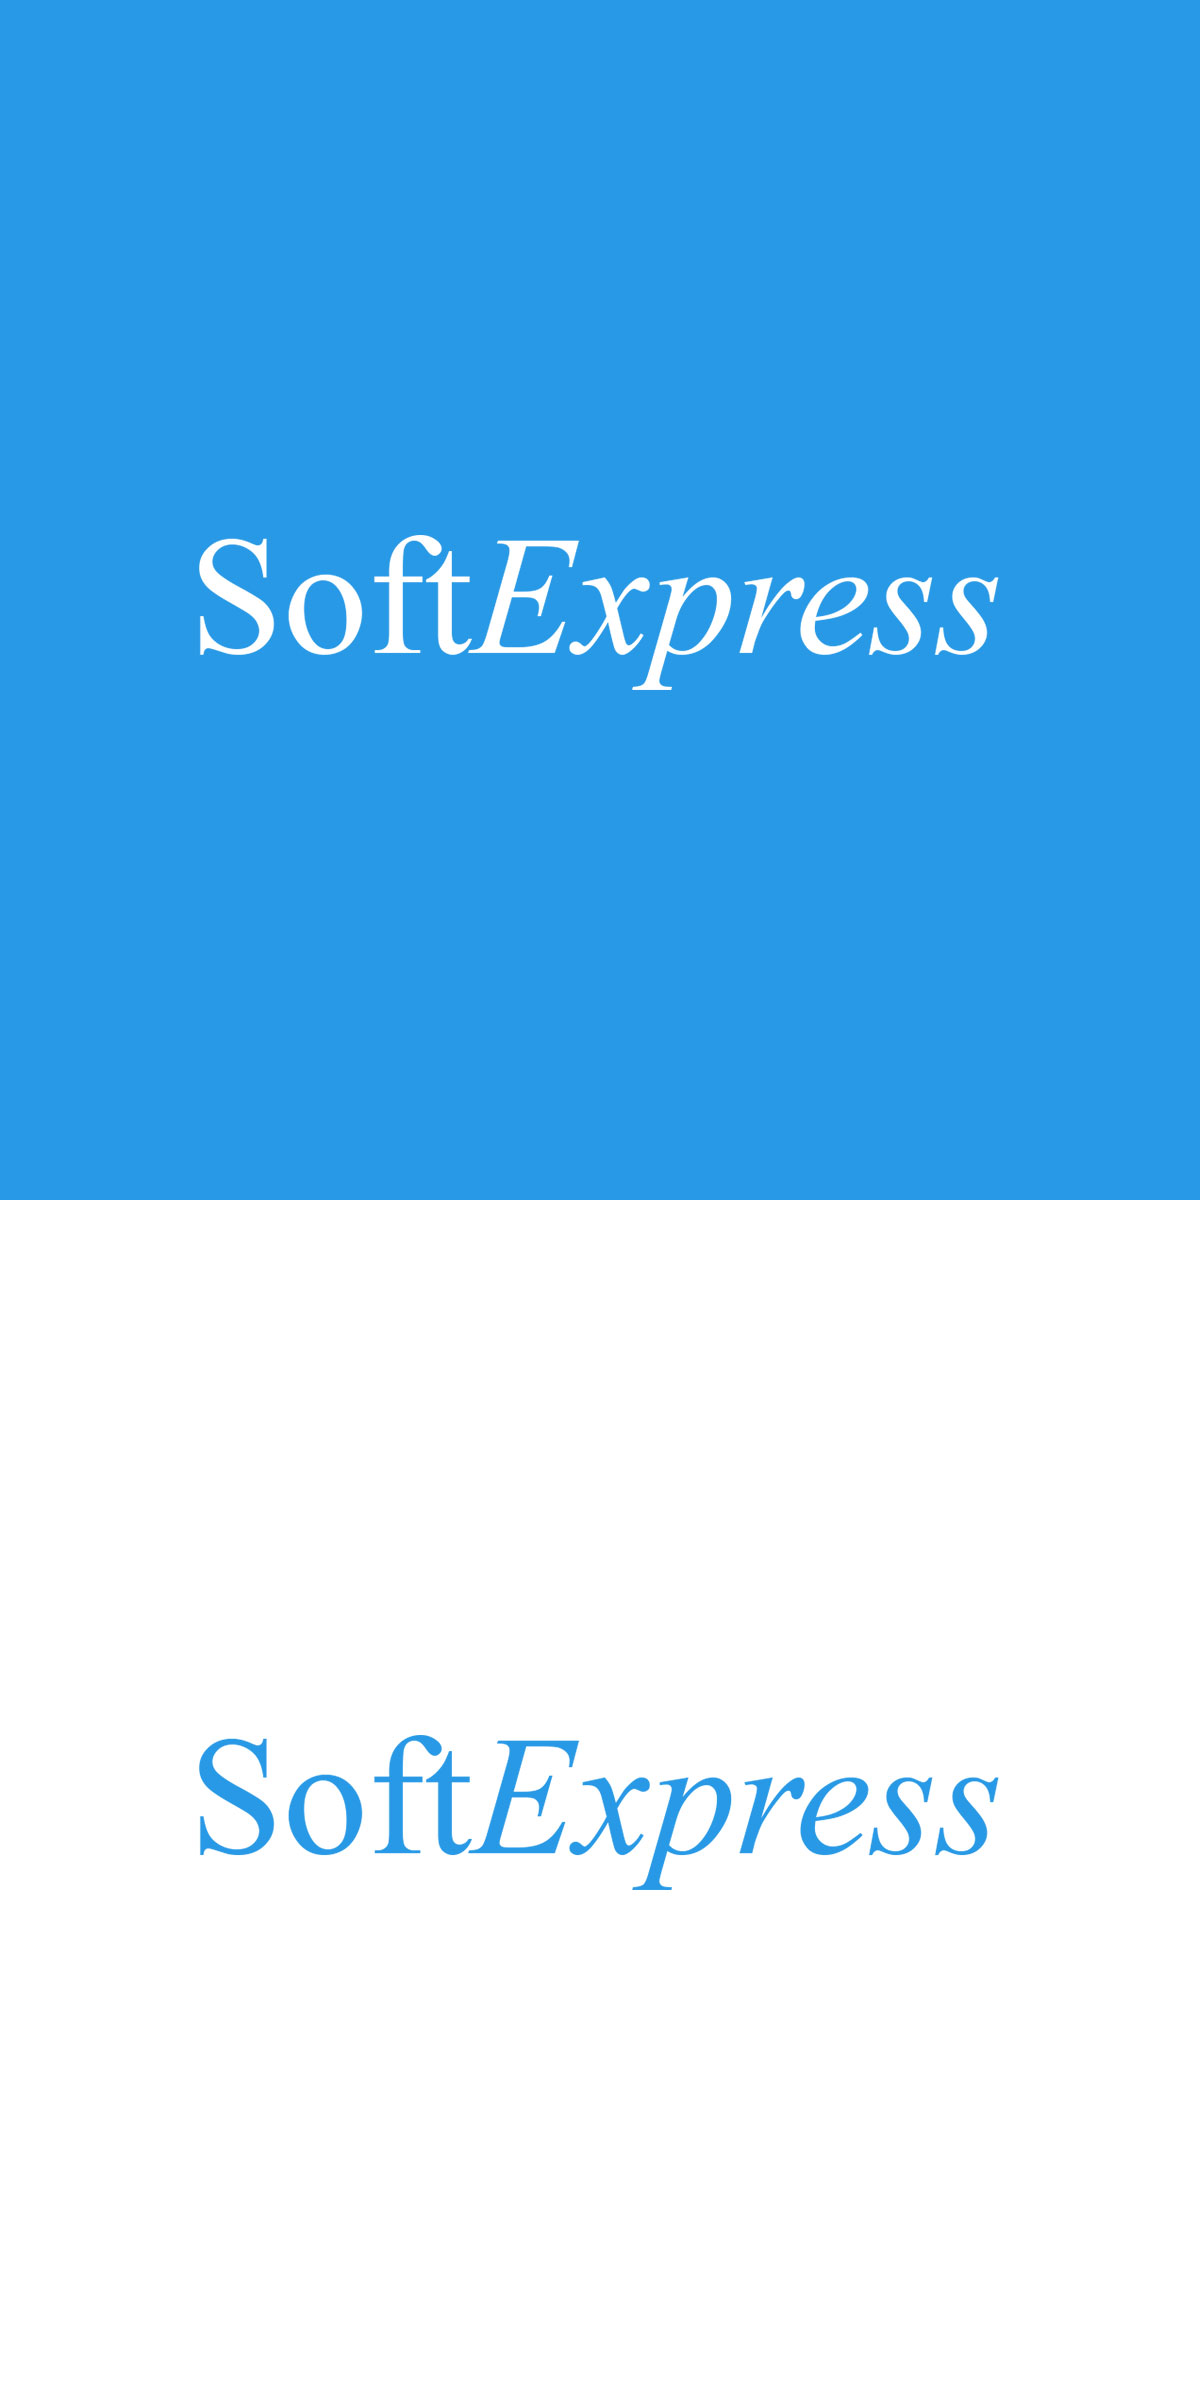 SoftExpress